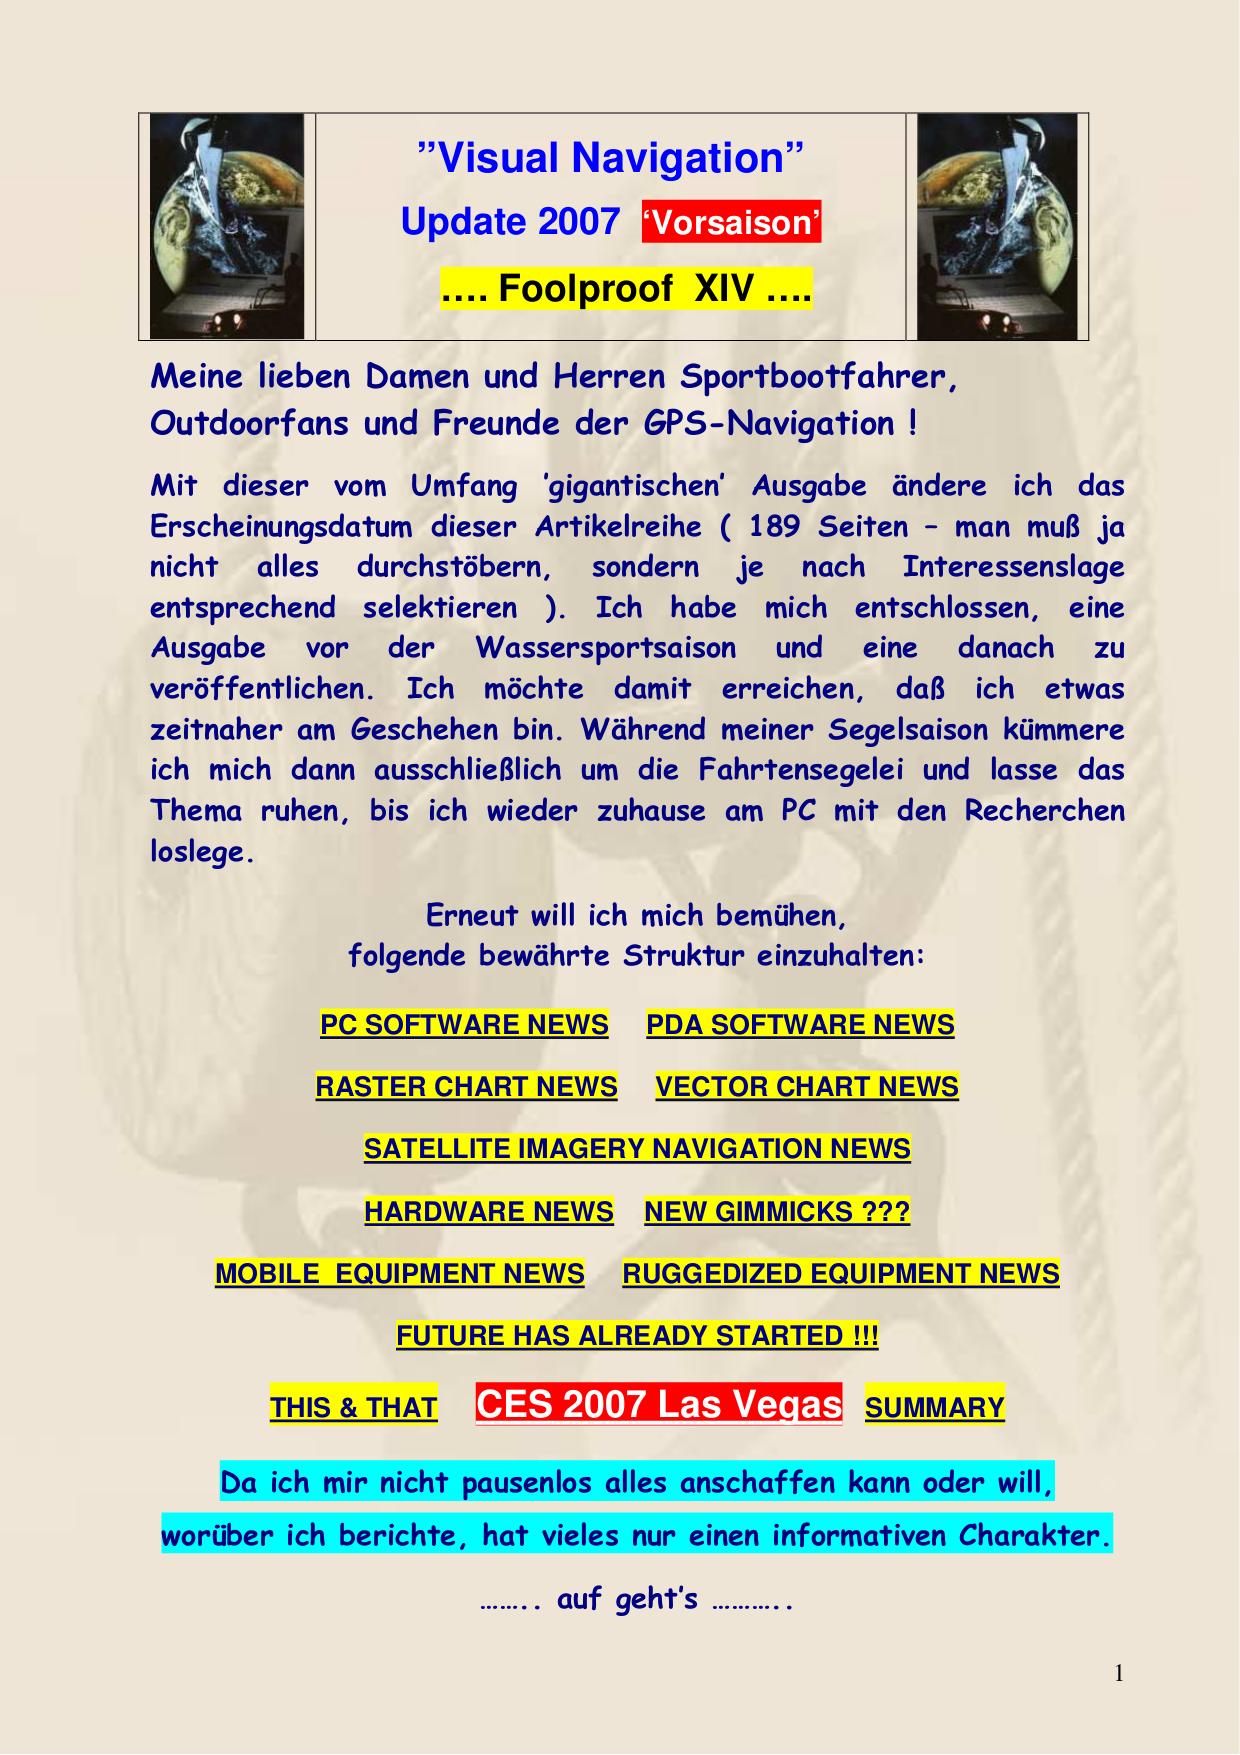 pdf for Lowrance GPS LMS-339C DF iGPS manual